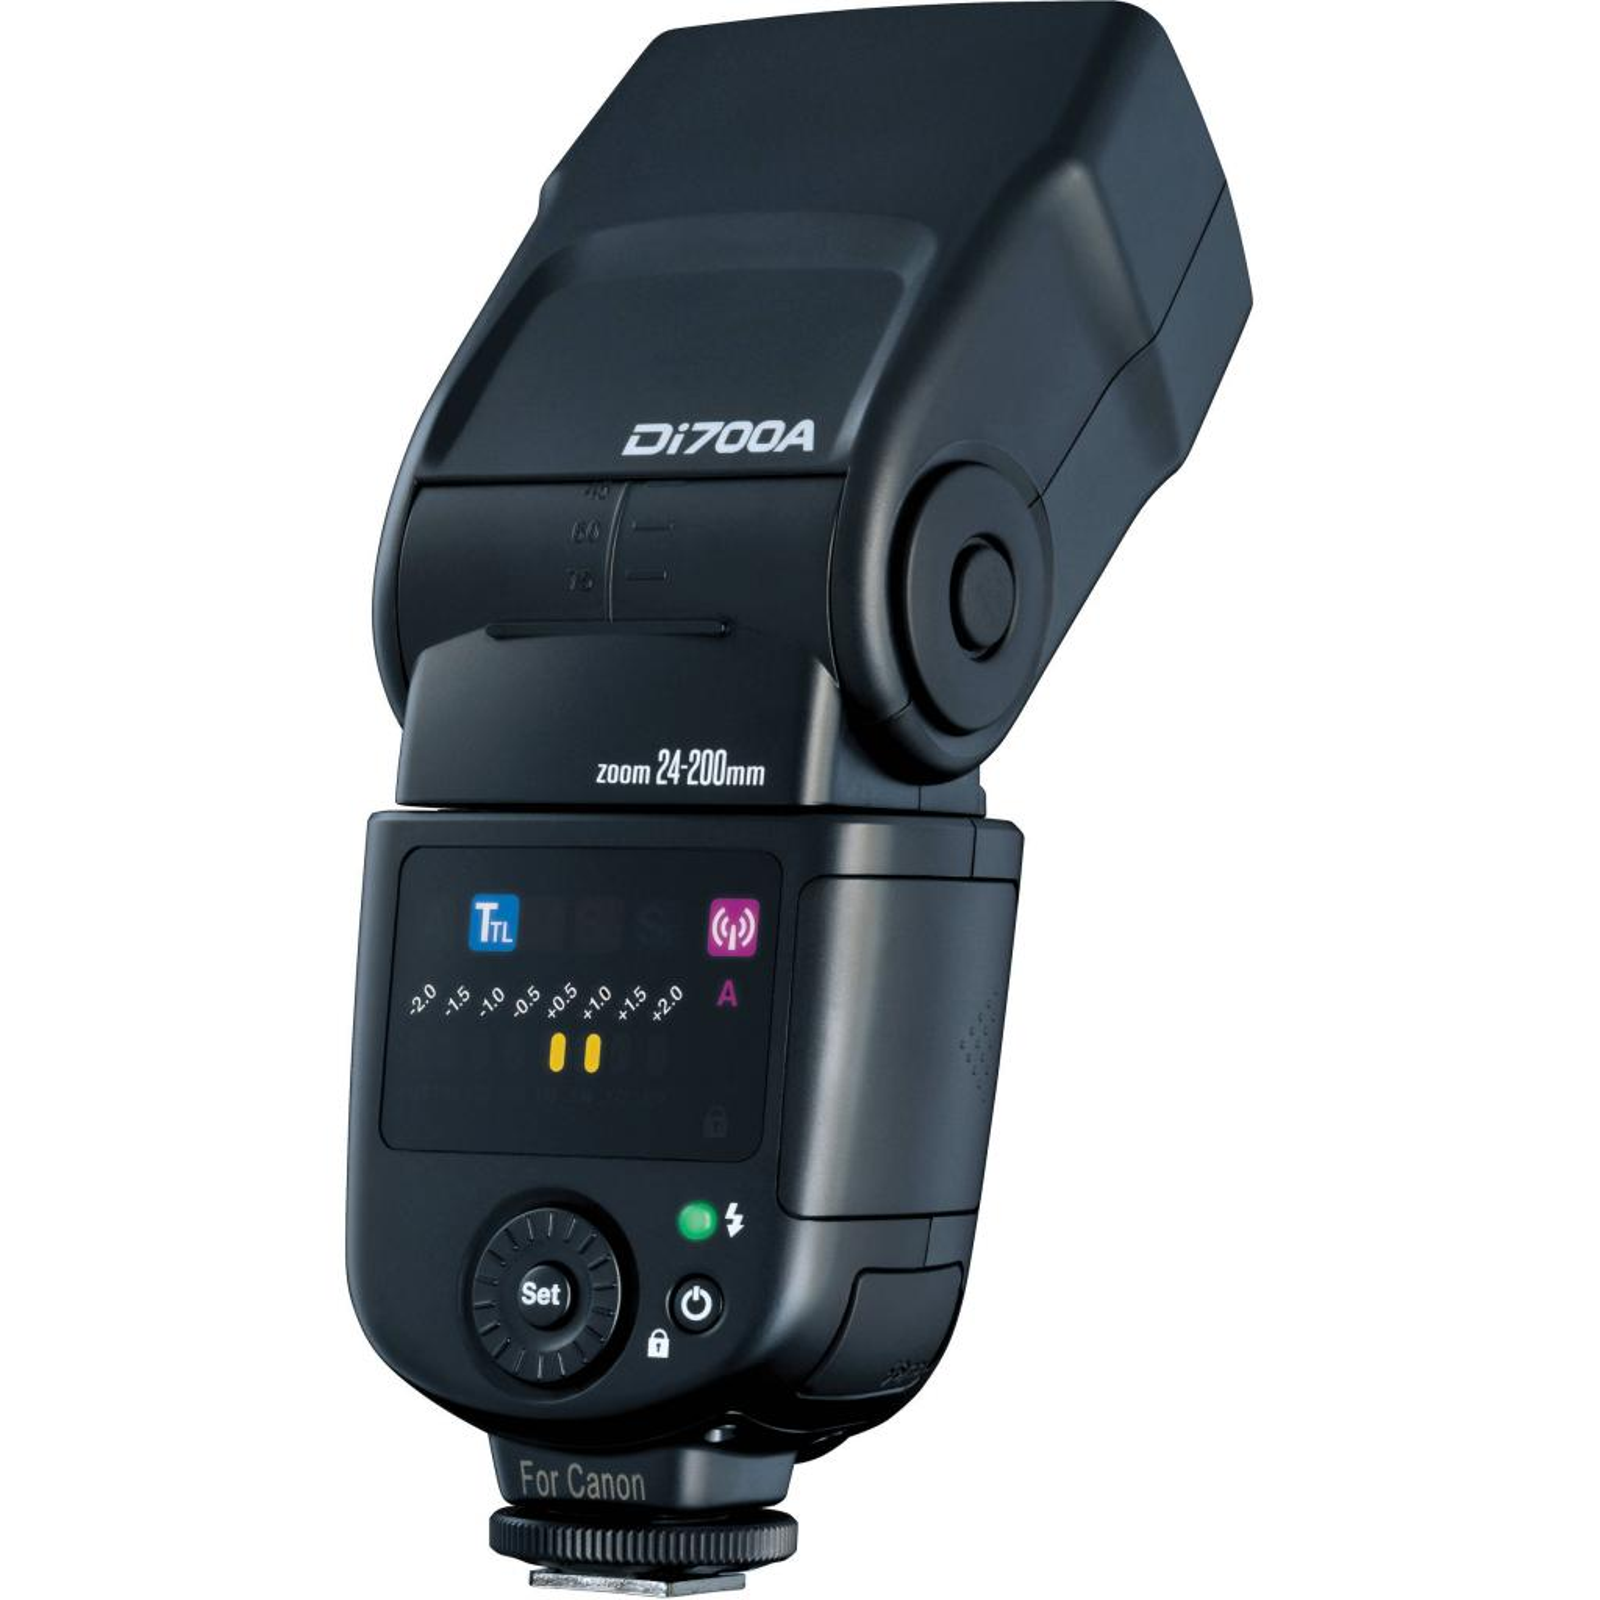 Вспышка Nissin Speedlite Di700A Kit Canon (N086) изображение 2